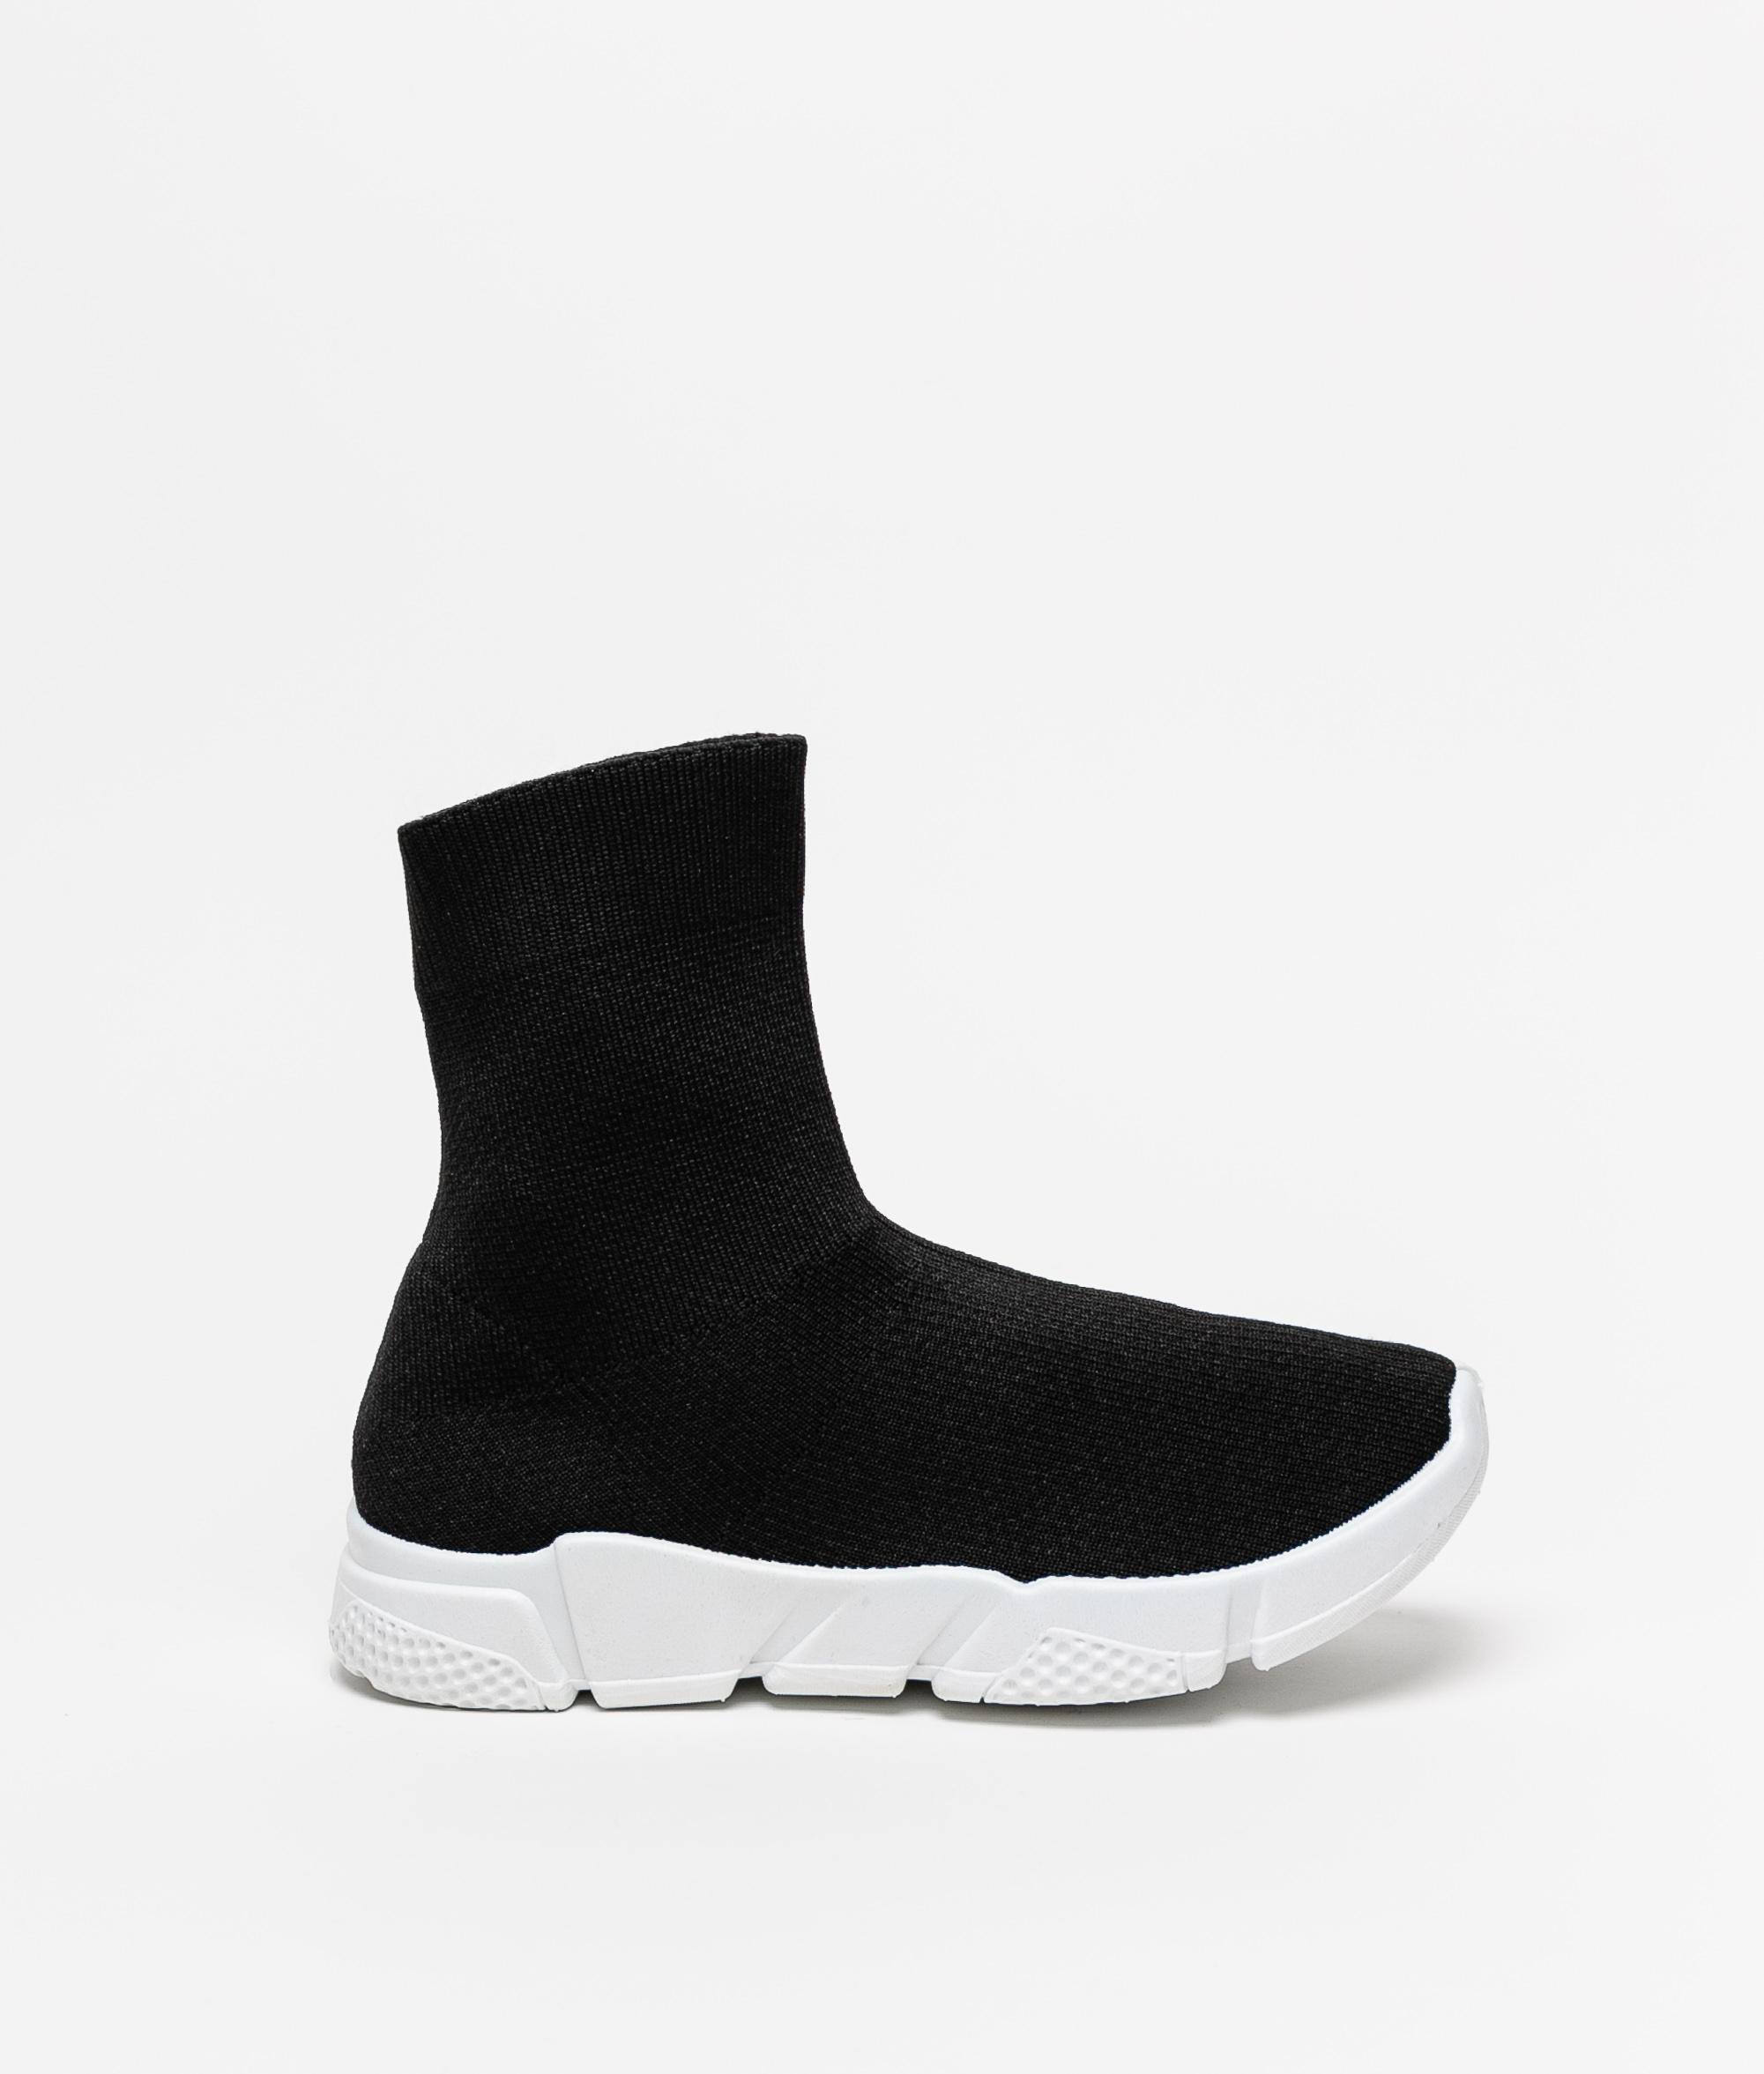 Sneakers Letin - Preto